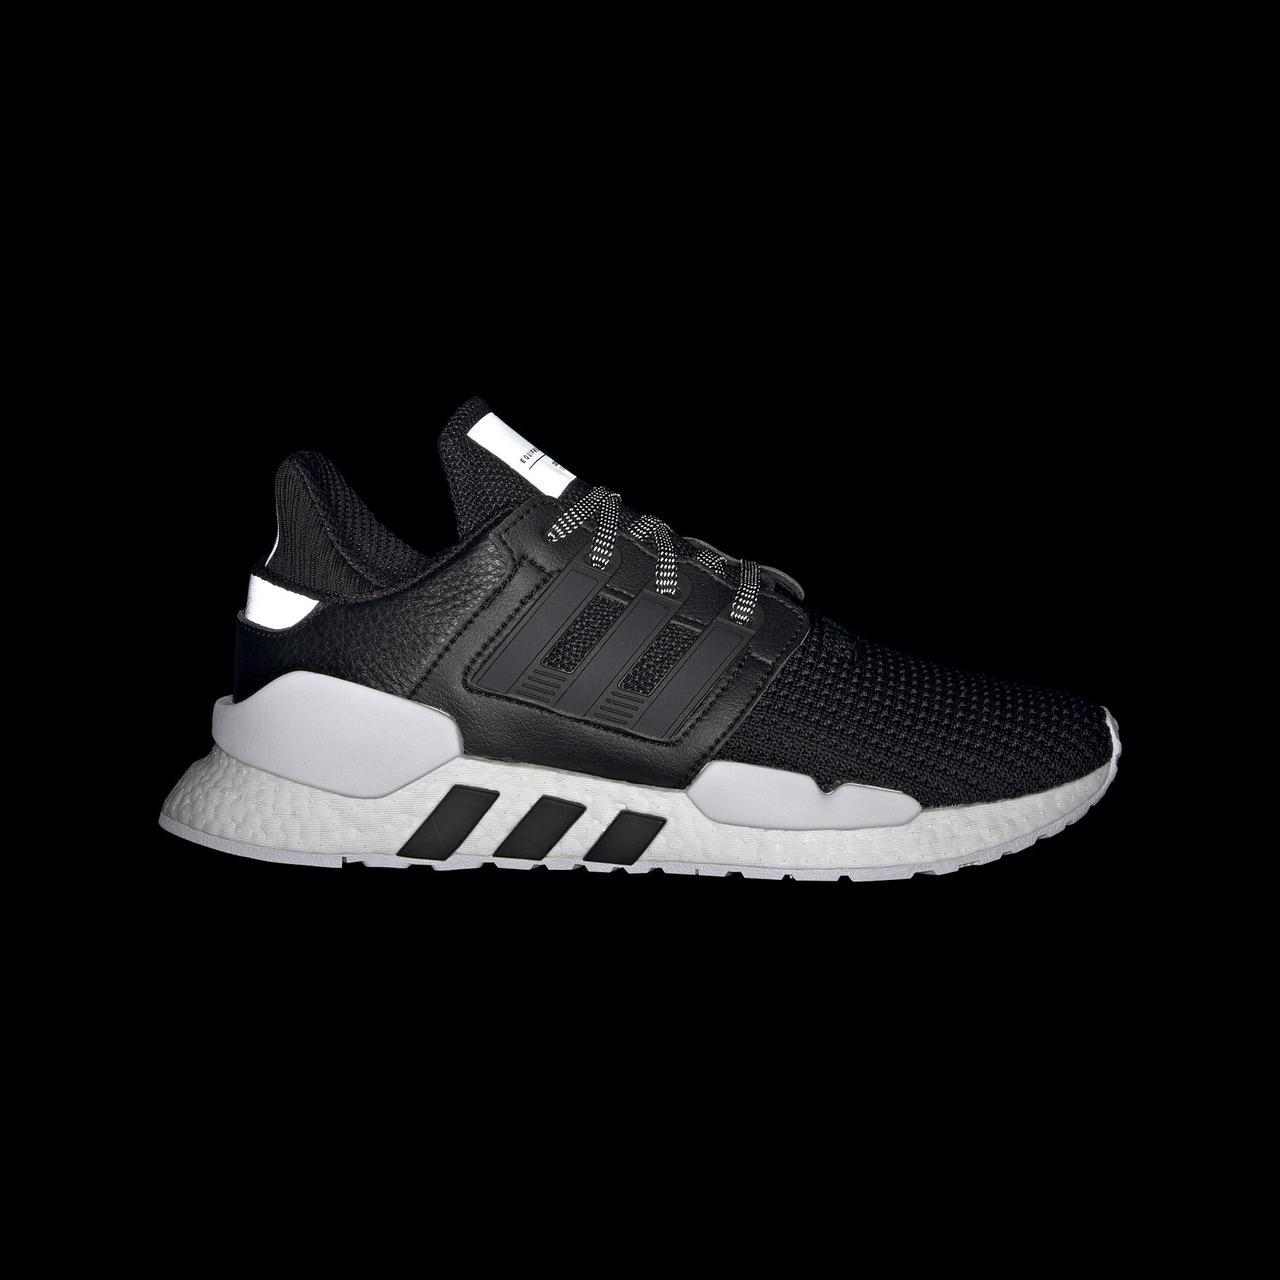 0f2c9237 Кроссовки мужские Adidas EQT Support 91/18 BD7793 - 2019: продажа ...